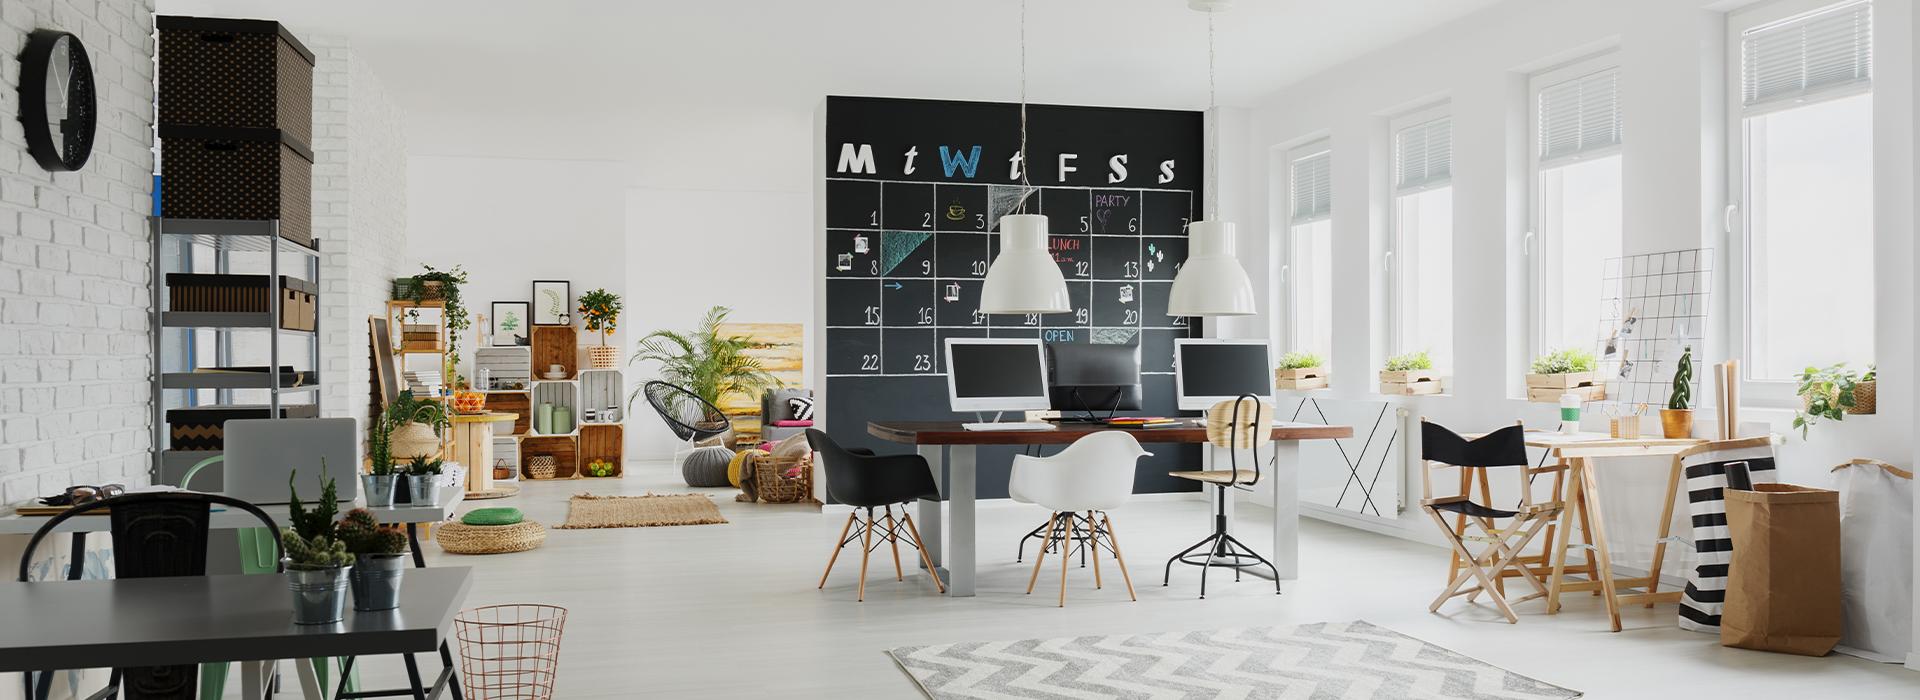 Branded Workspace